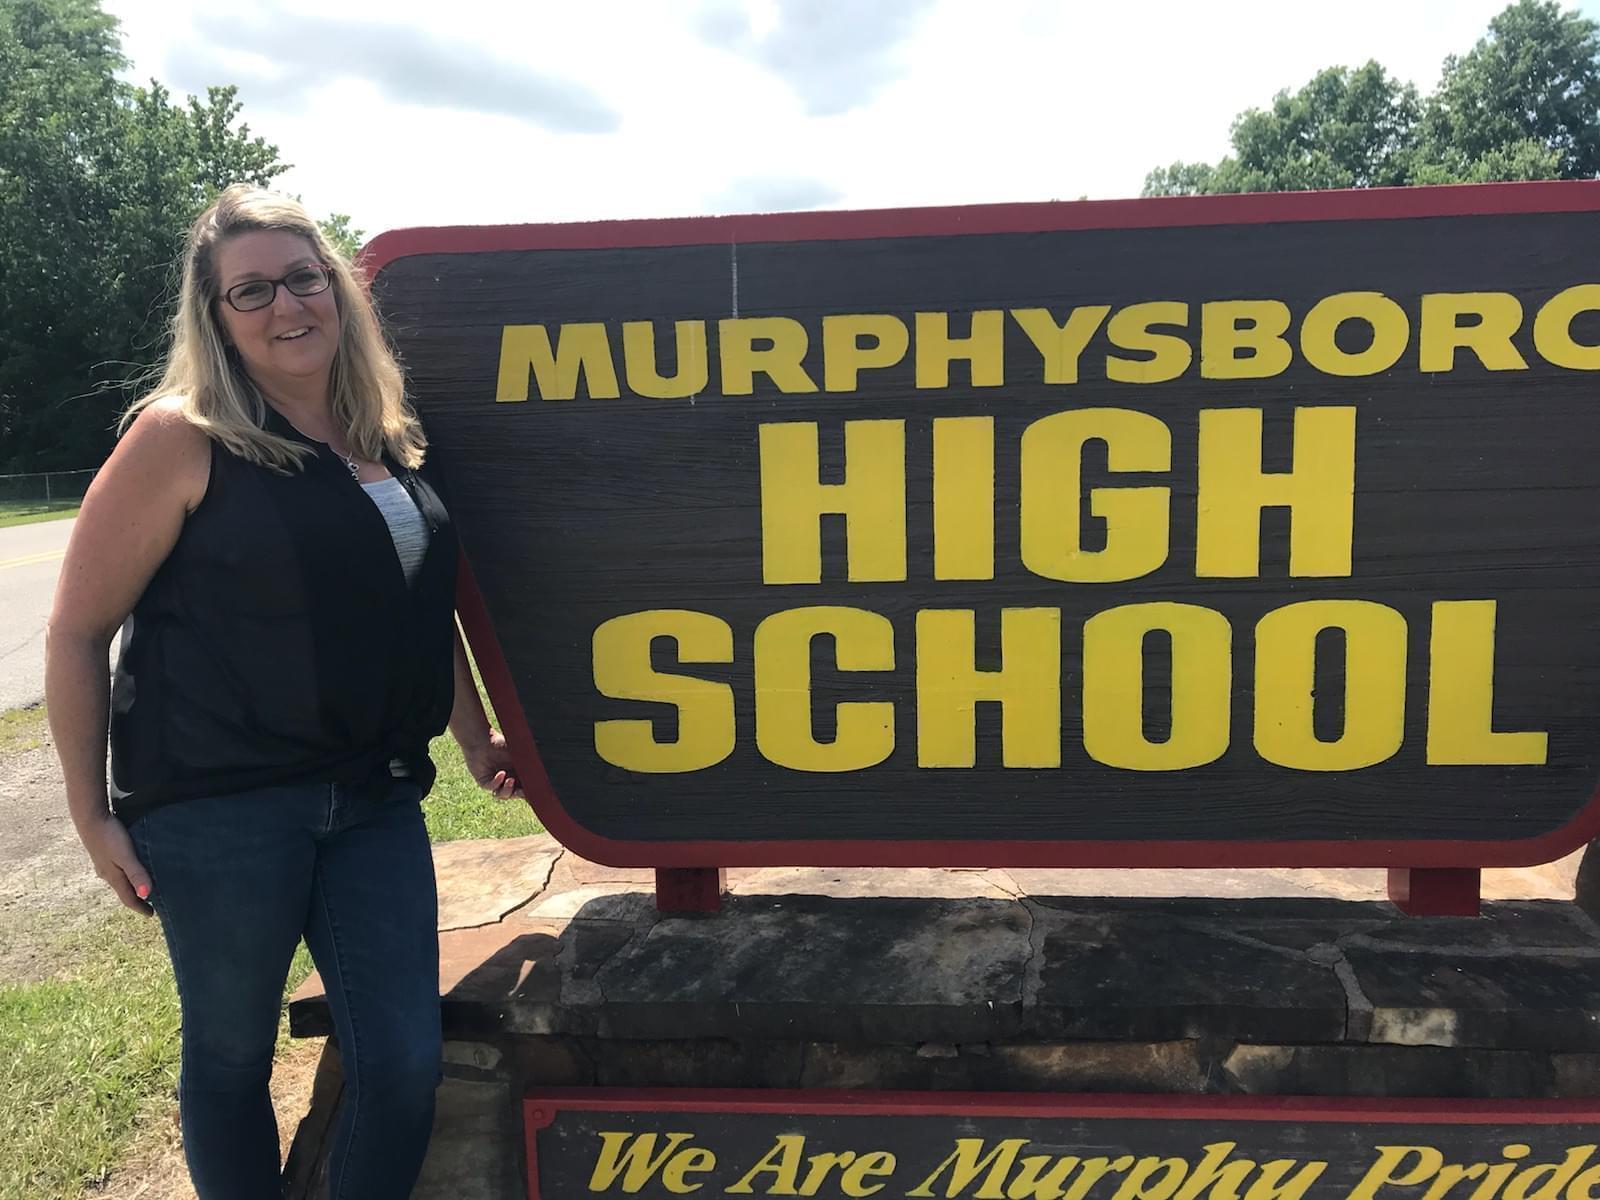 Murphysboro High School teacher Stacie Tefft stands next to a sign for the high school.